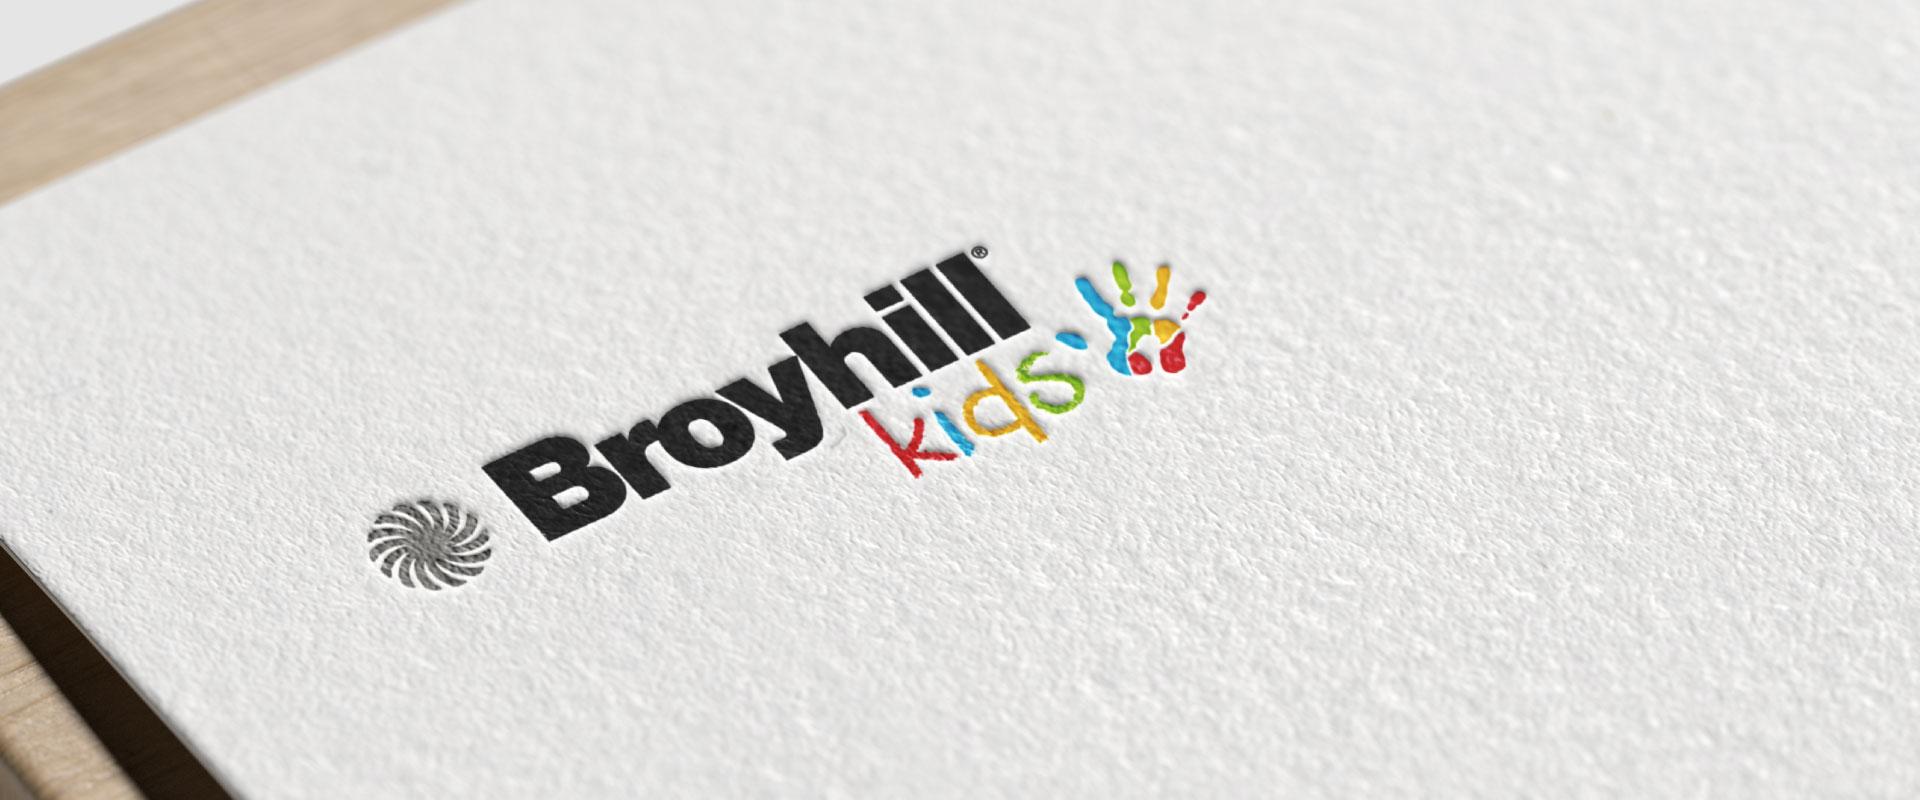 broyhill-kids-brand-logo-design-by-mapleweb-vancouver-canada-white-paper-mock broyhill-kids-logo-design-process